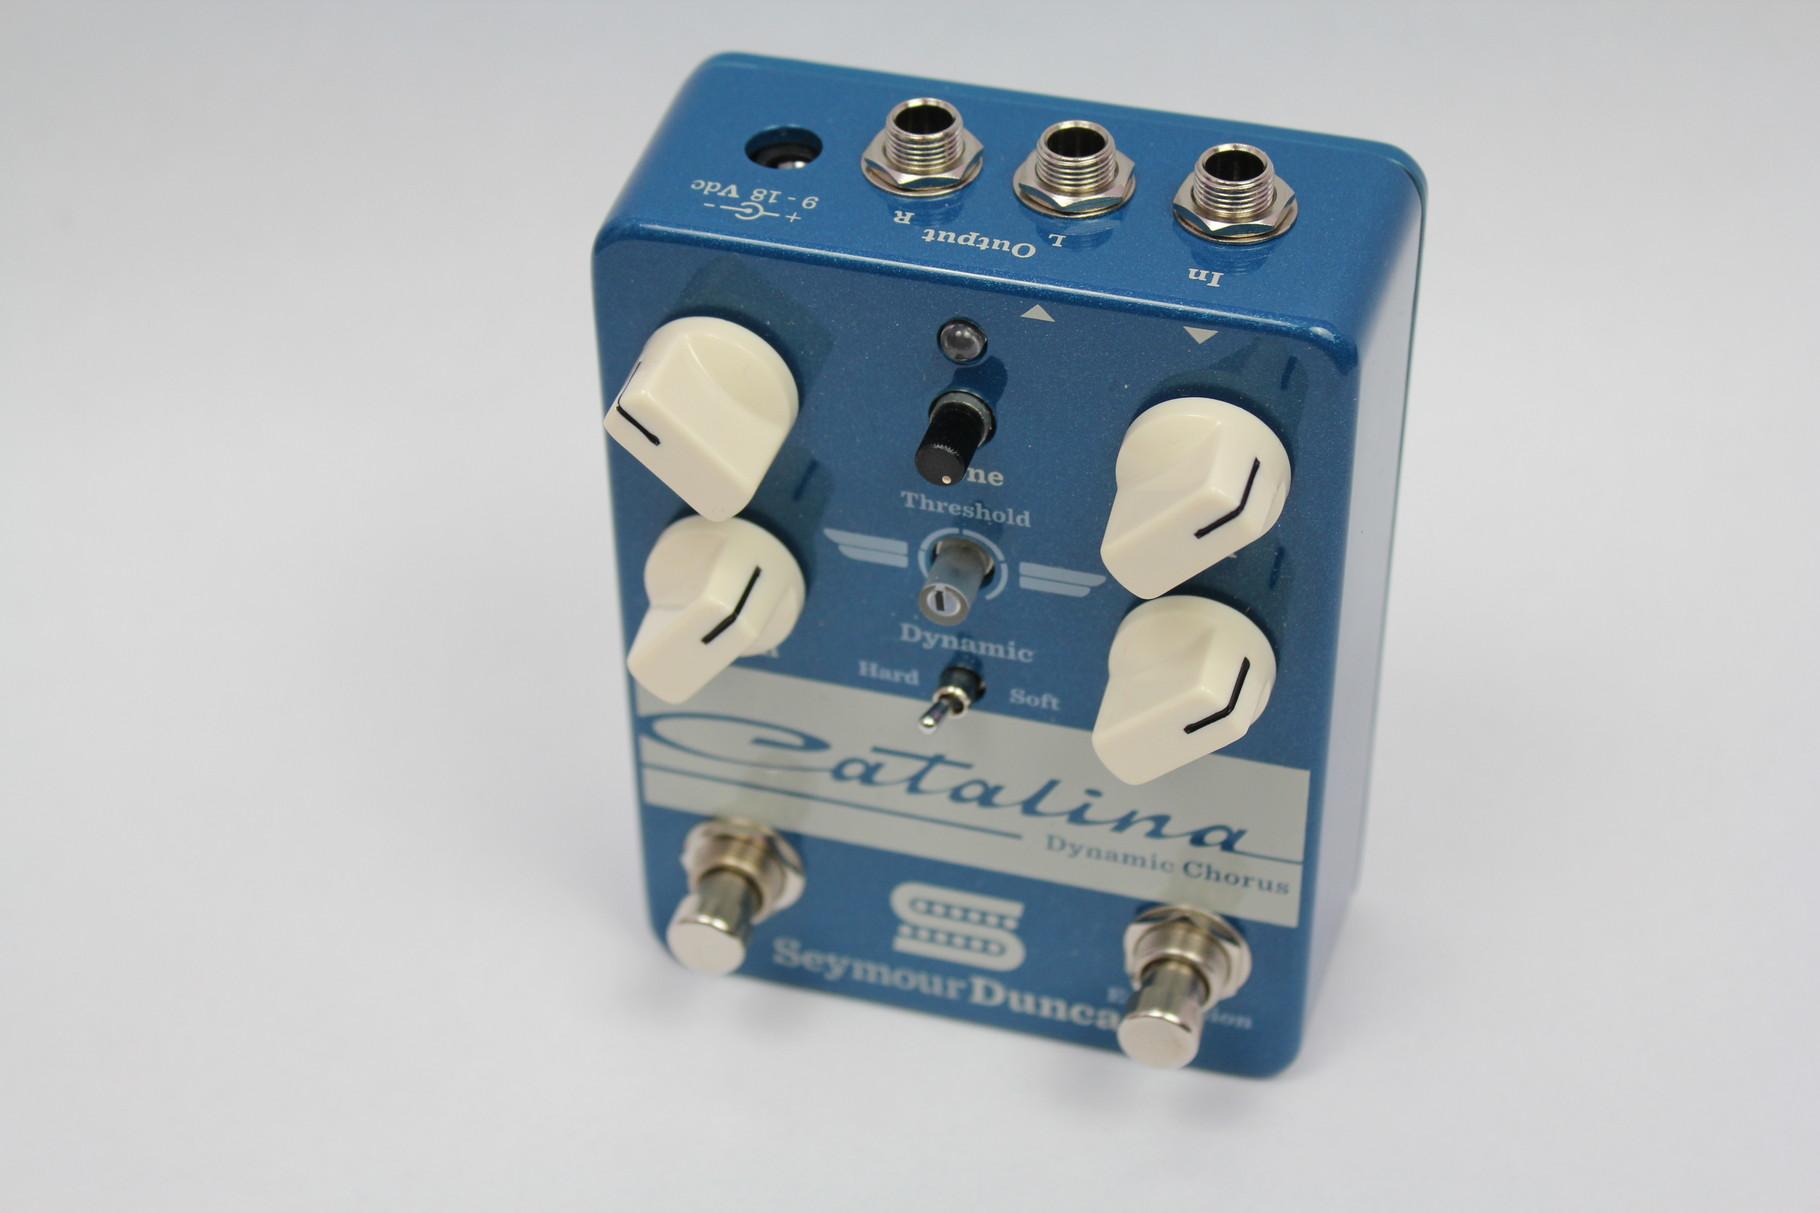 Seymour Duncan Catalina Dynamic Chorus Pedal